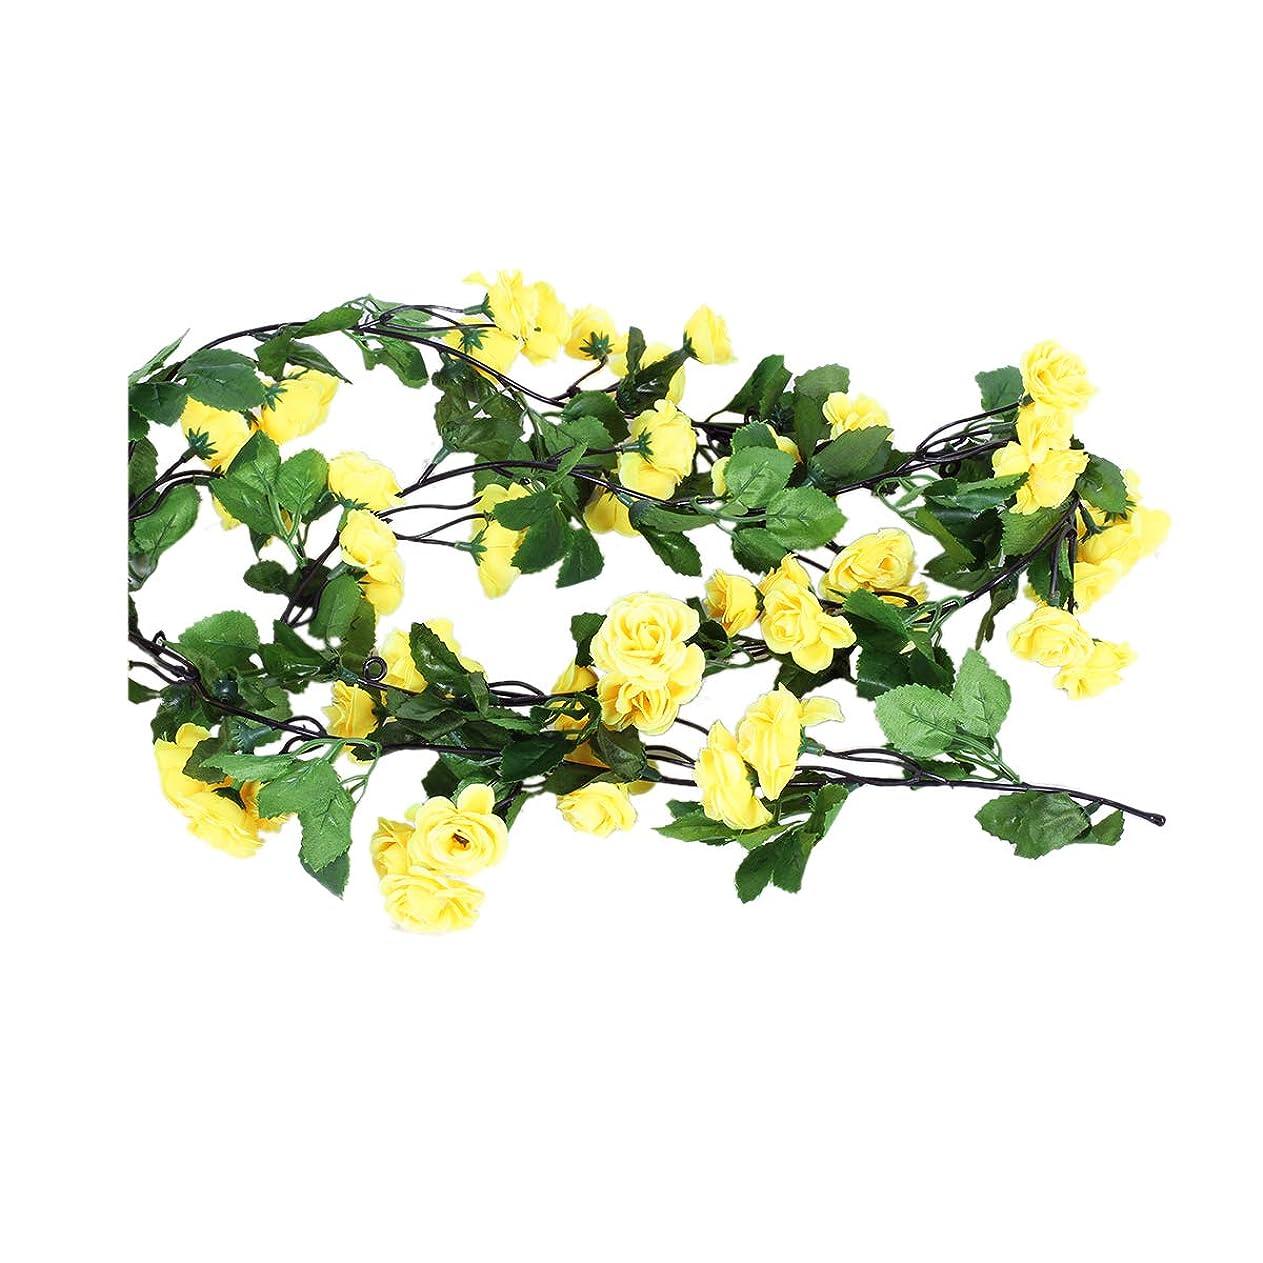 Li Hua Catローズガーランド緑葉付き造花バラツル63インチ 自宅結婚式装飾用 フラワーガーランド3個パック イエロー